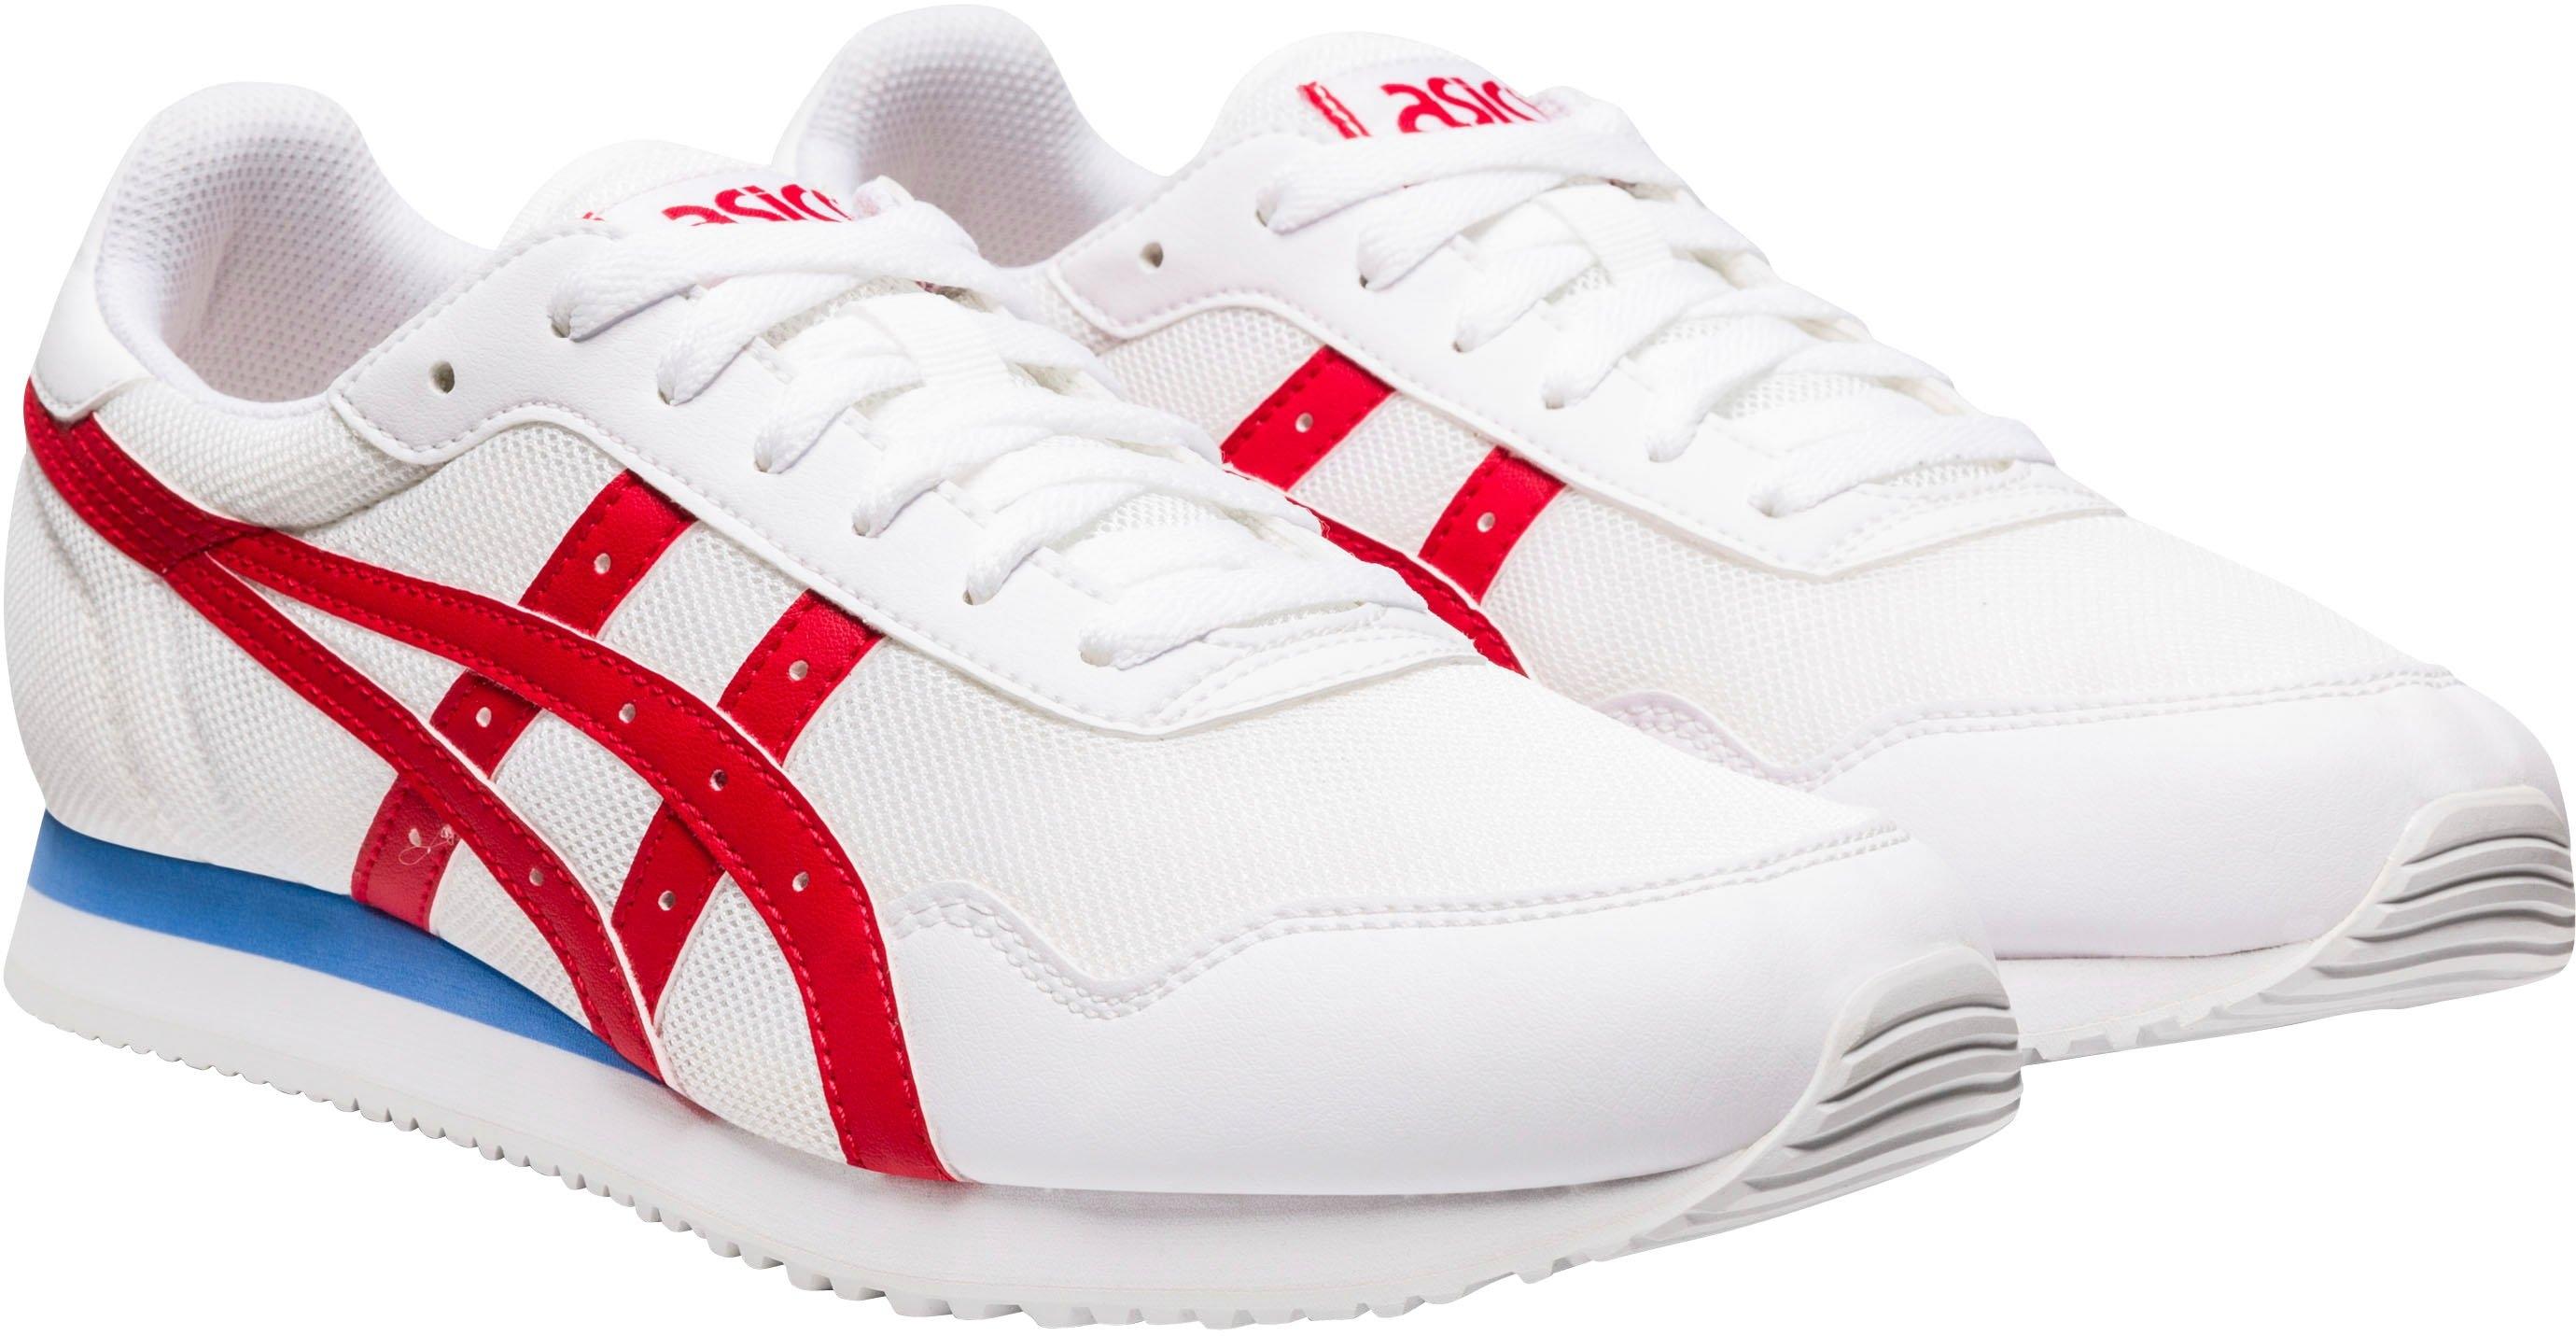 ASICS tiger sneakers TIGER RUNNER - gratis ruilen op otto.nl